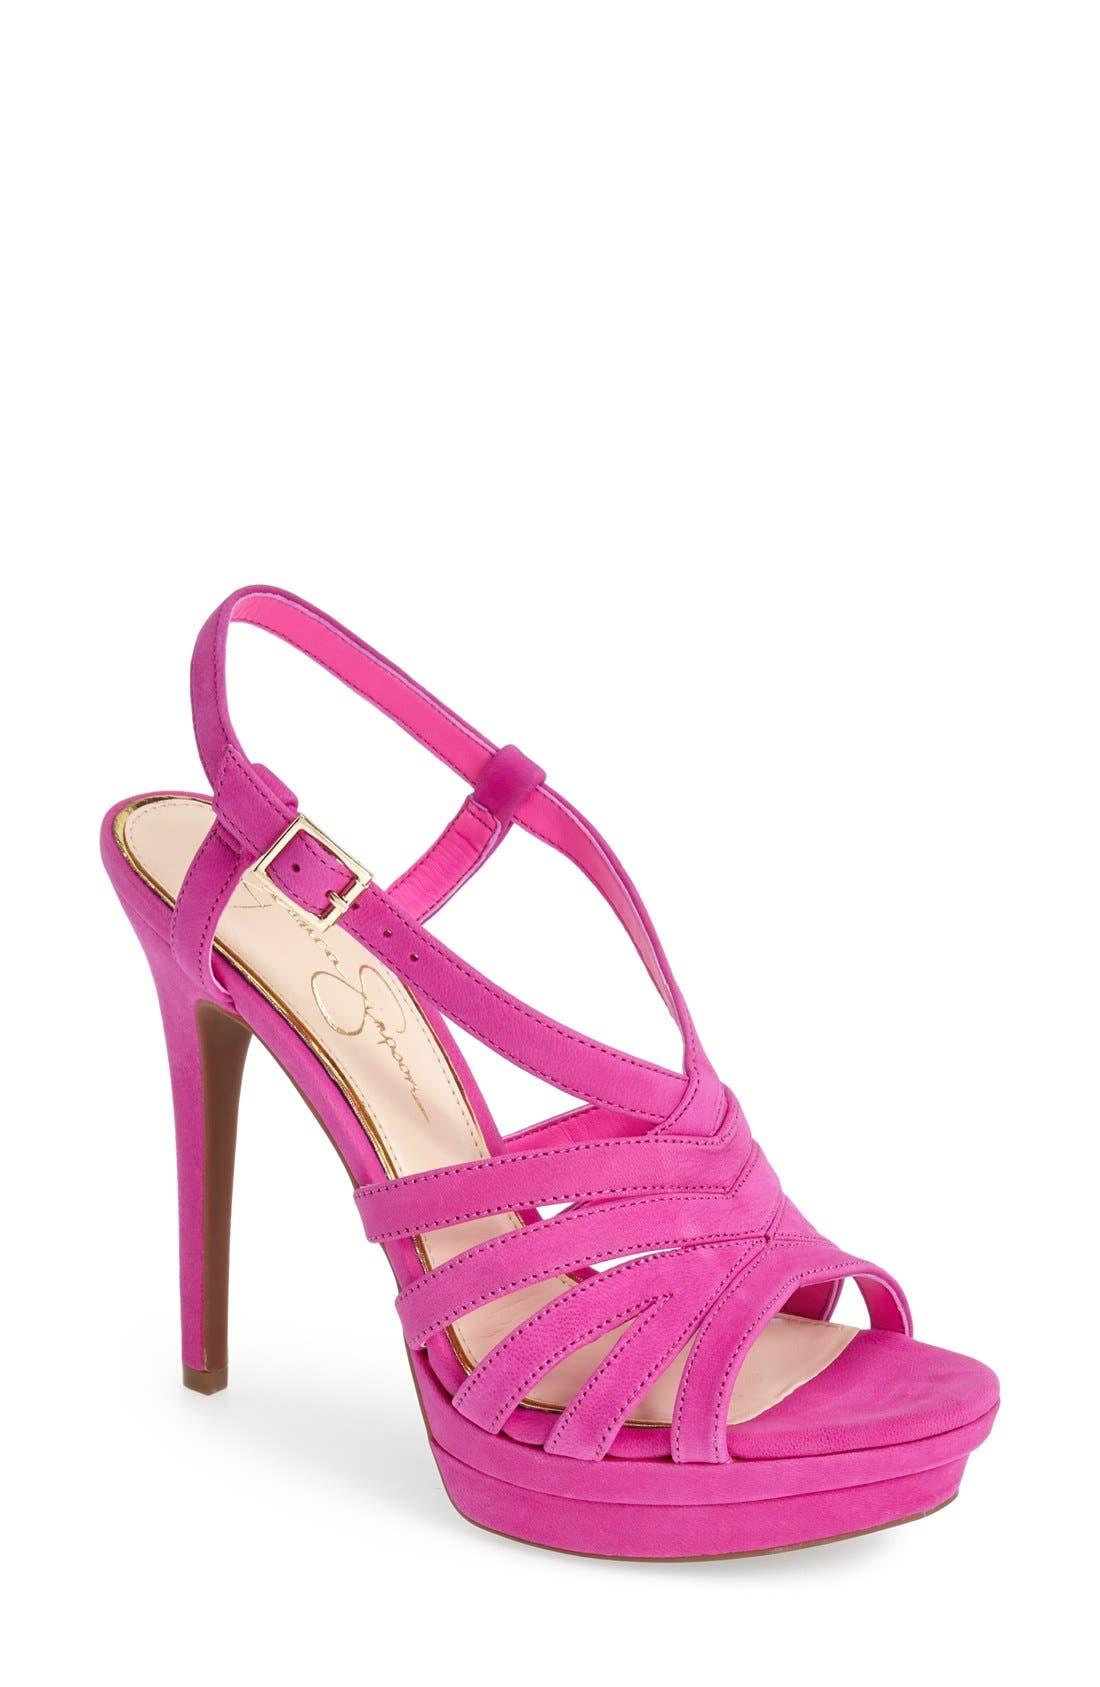 Main Image - Jessica Simpson 'Peace' Suede Peep Toe Platform Sandal (Women)